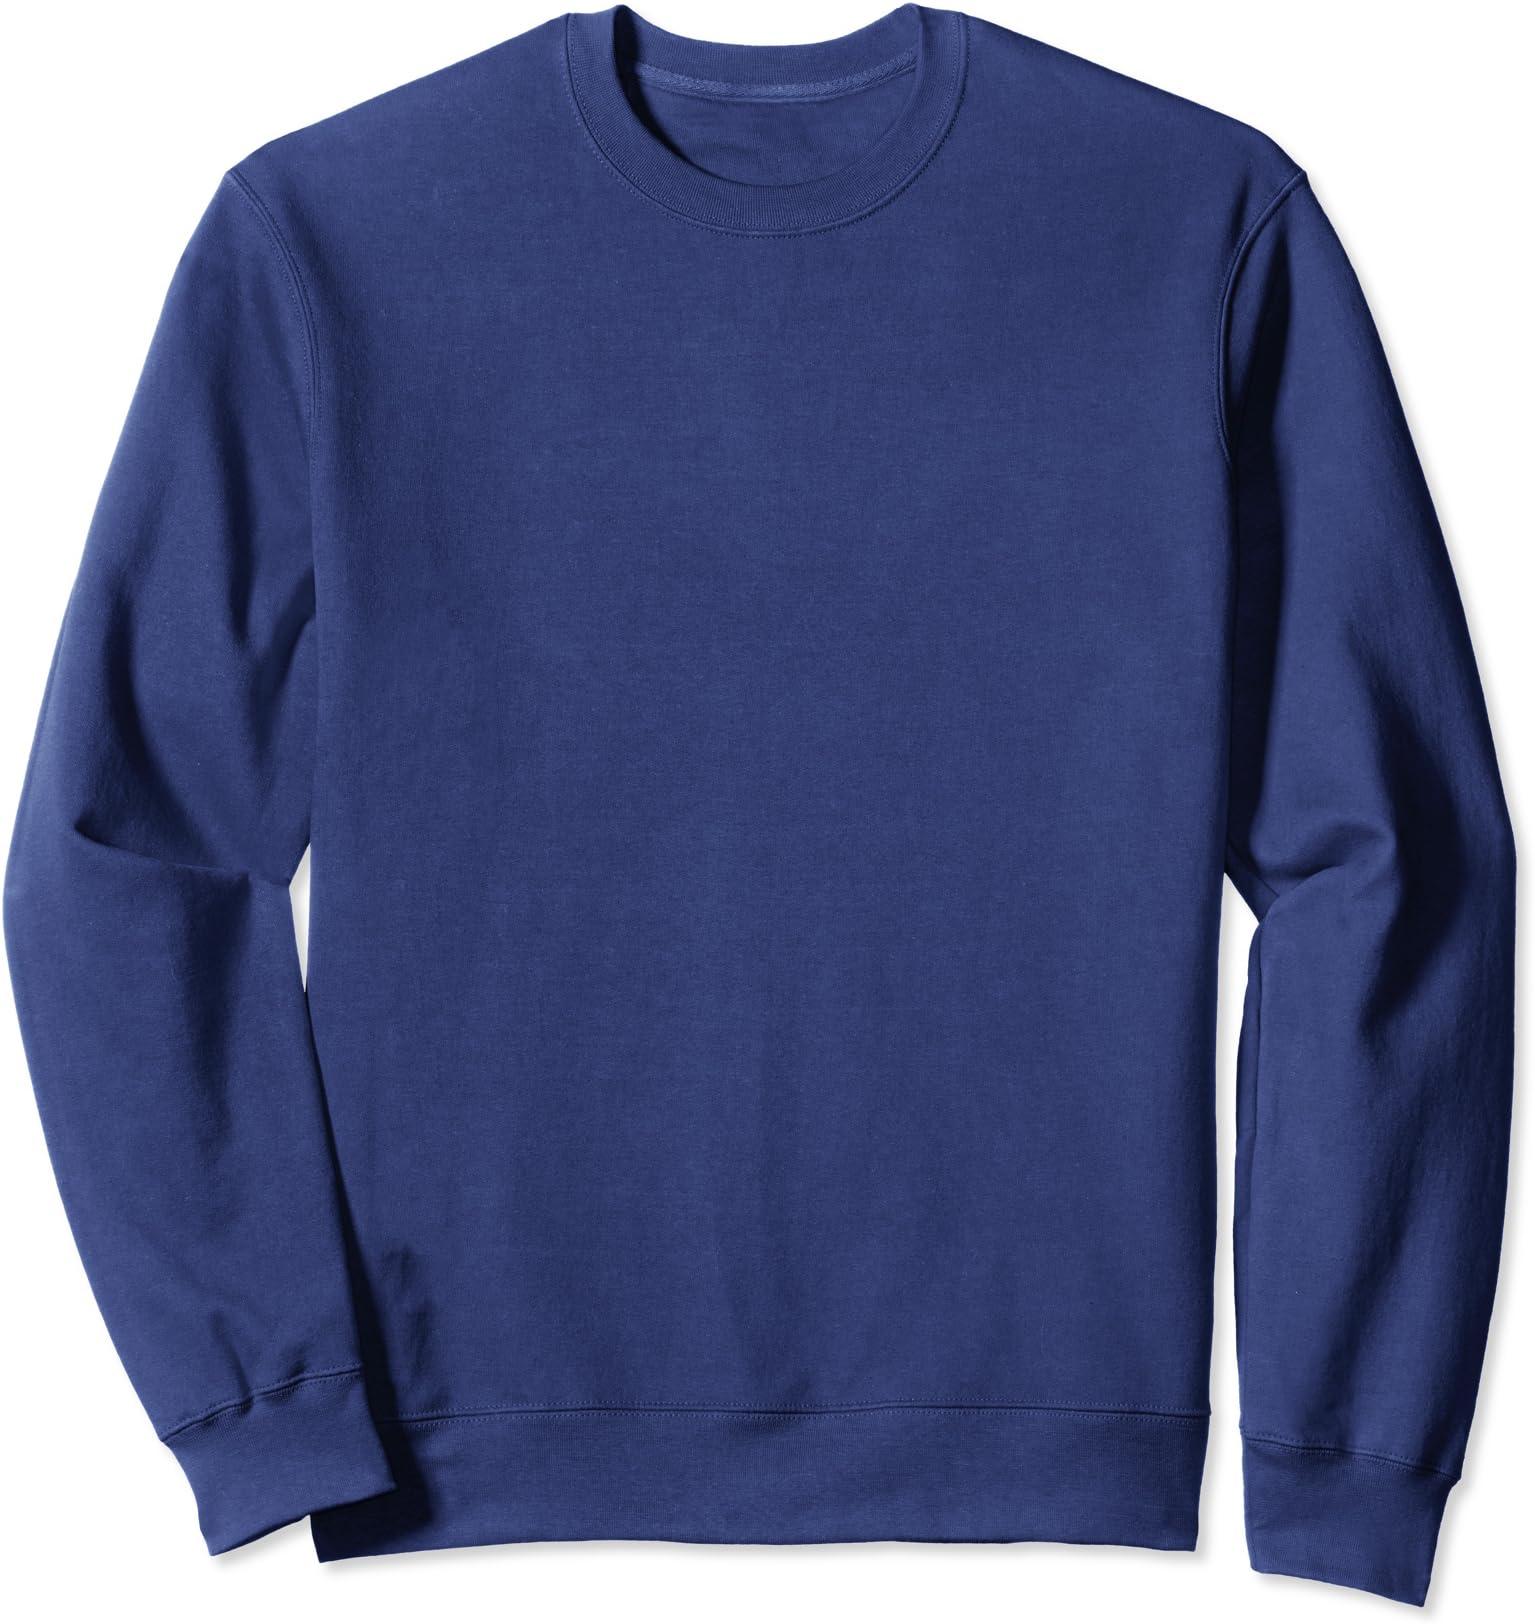 tee Pawma Definition Grandma for Dog Lovers Gift Unisex Sweatshirt